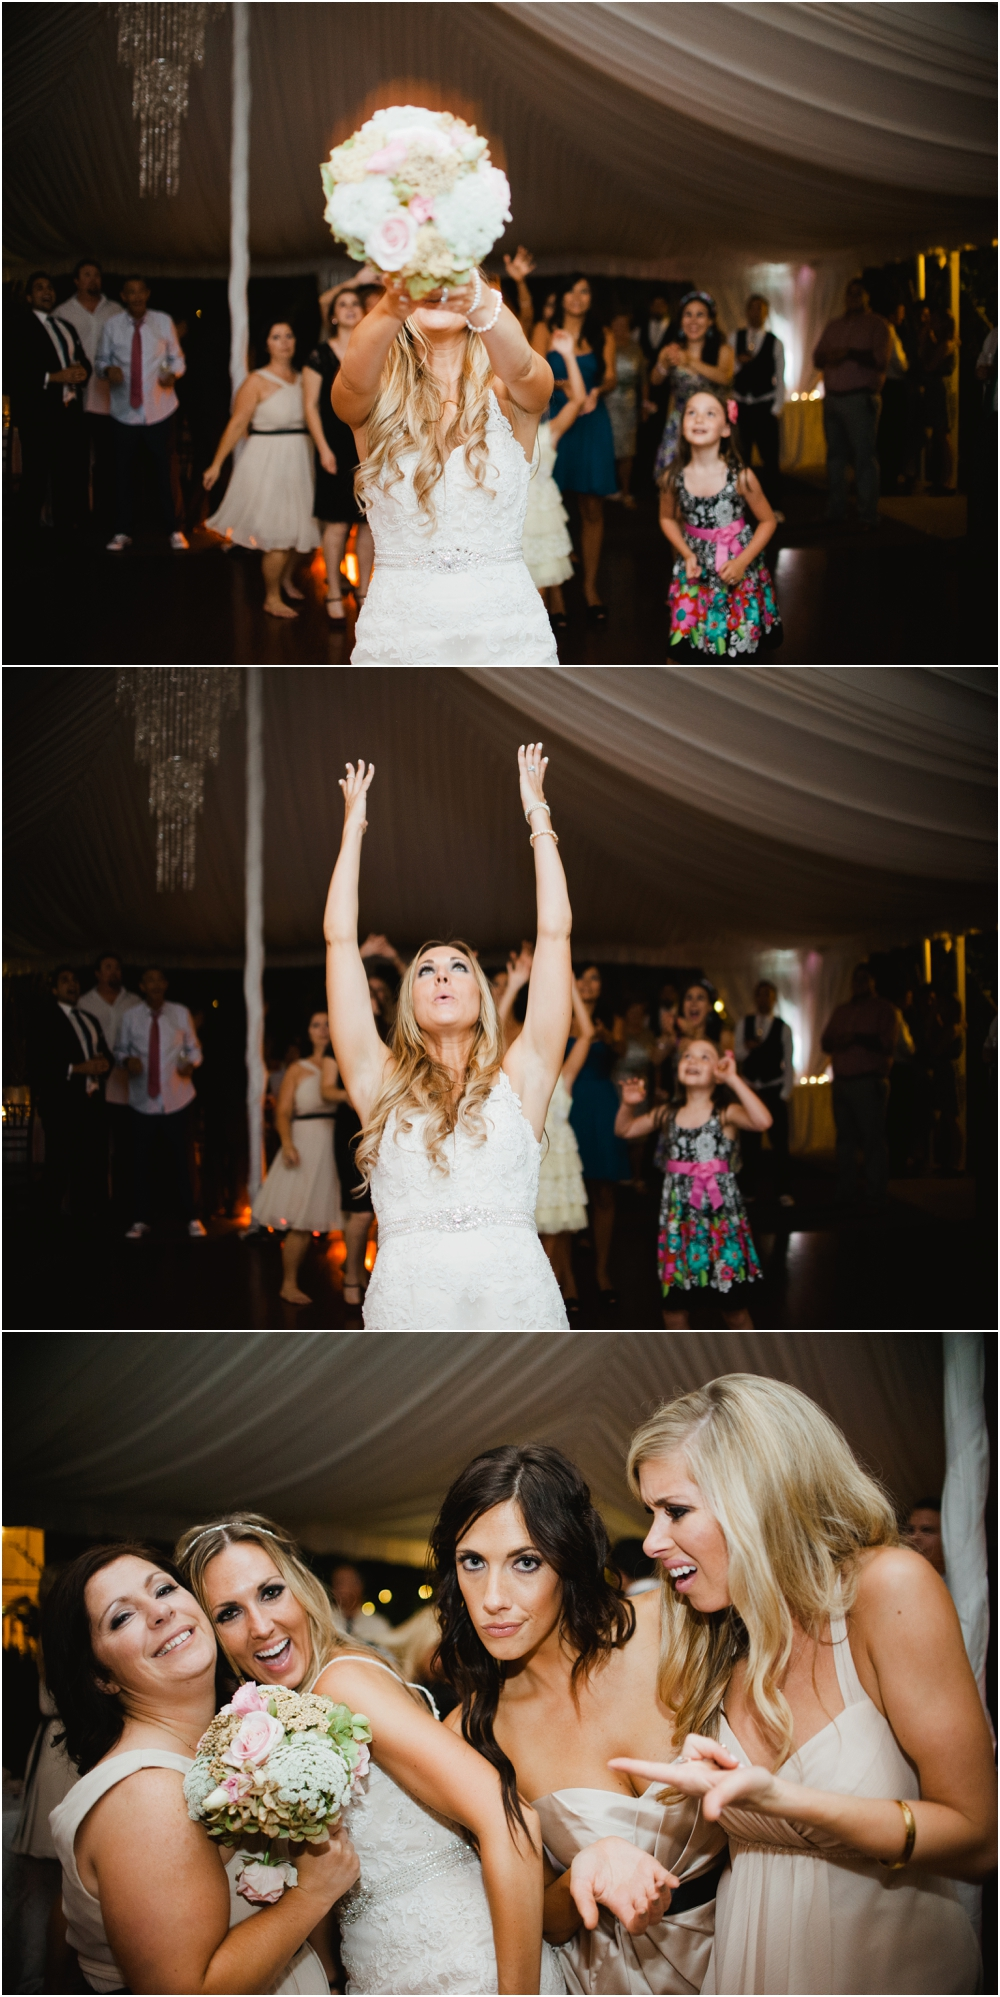 twin_oaks_weddings_photography_039.jpg